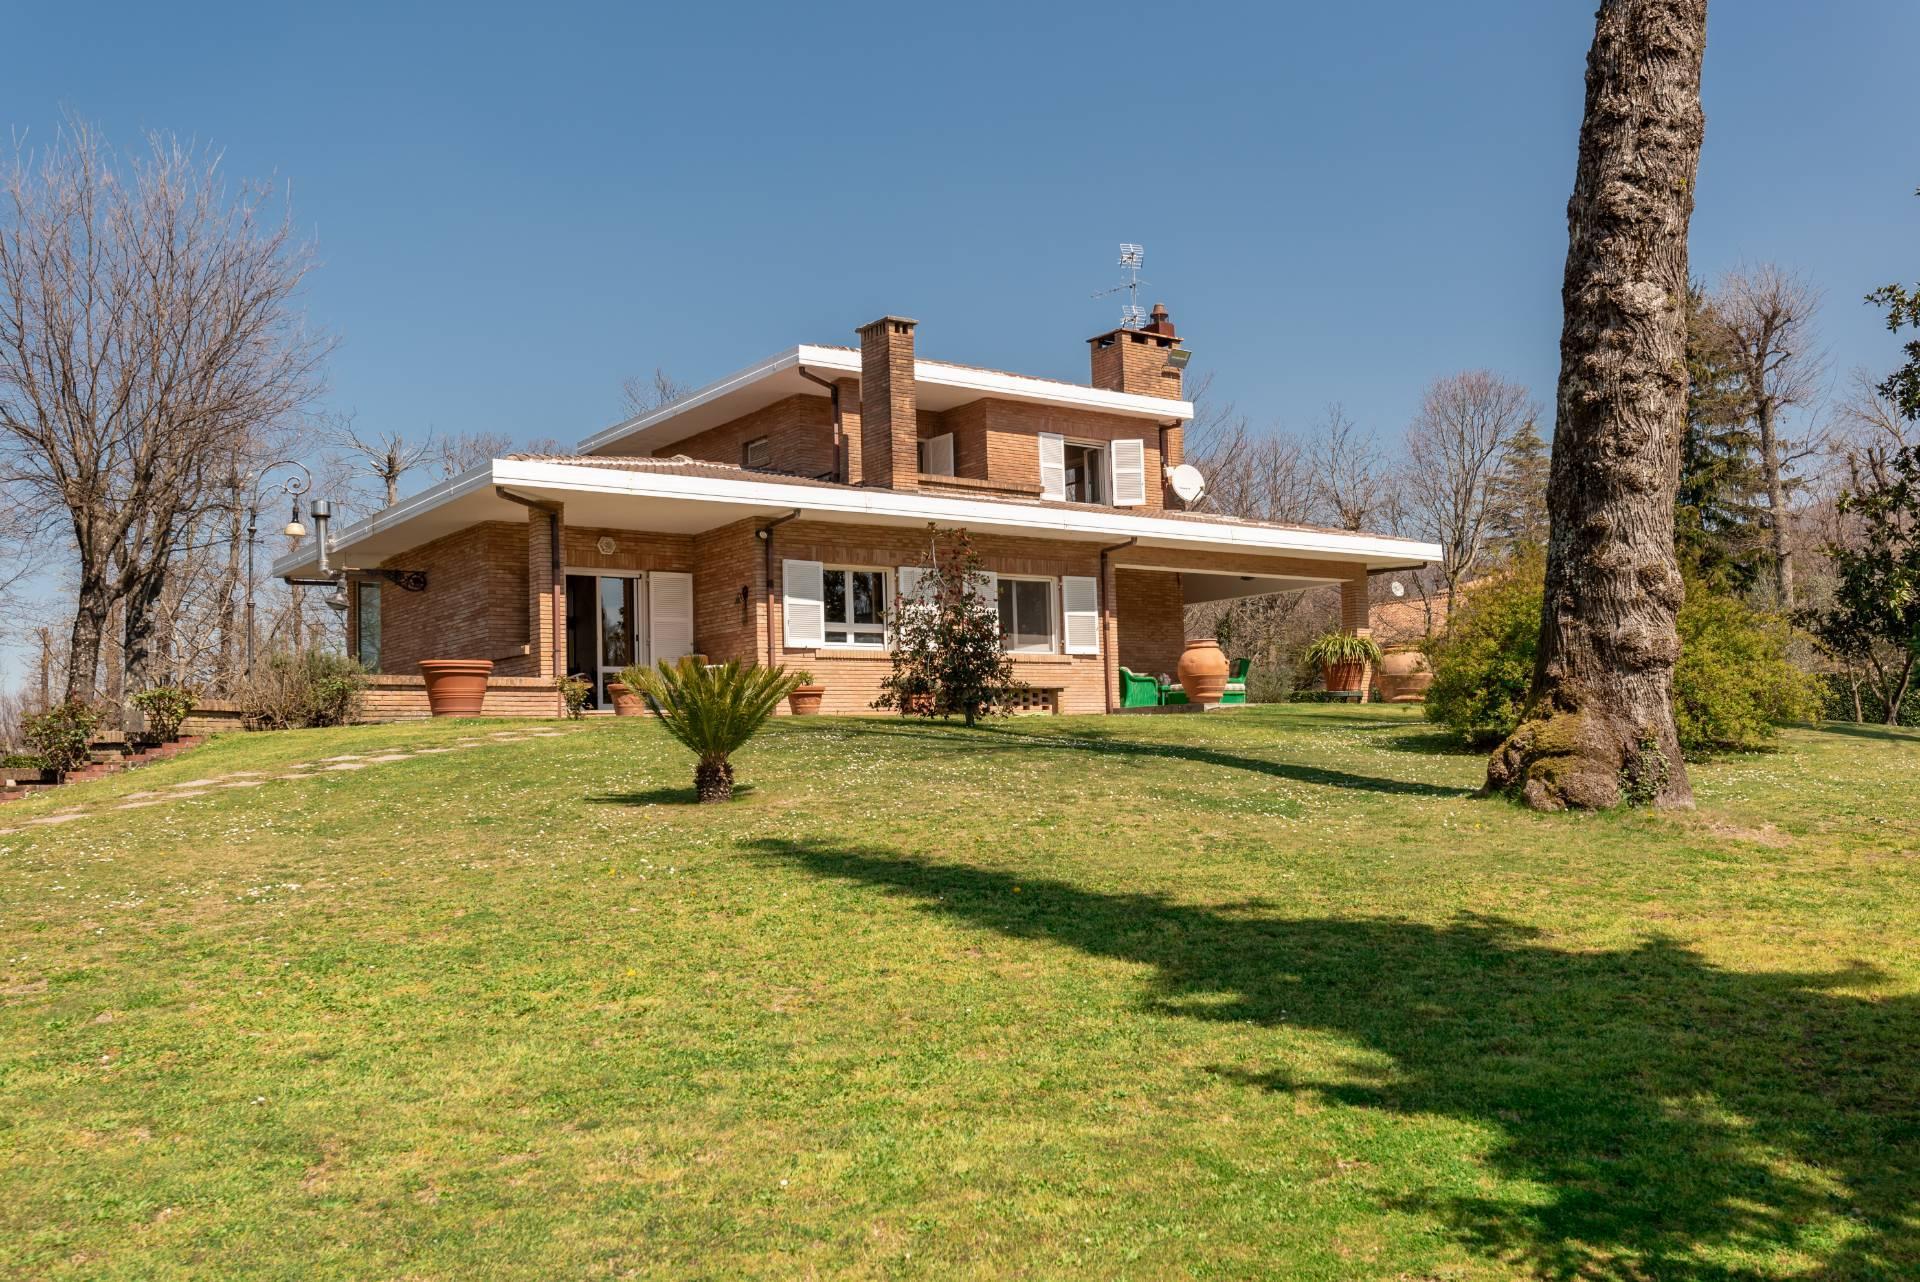 Villa in Vendita a Ariccia: 5 locali, 583 mq - Foto 3